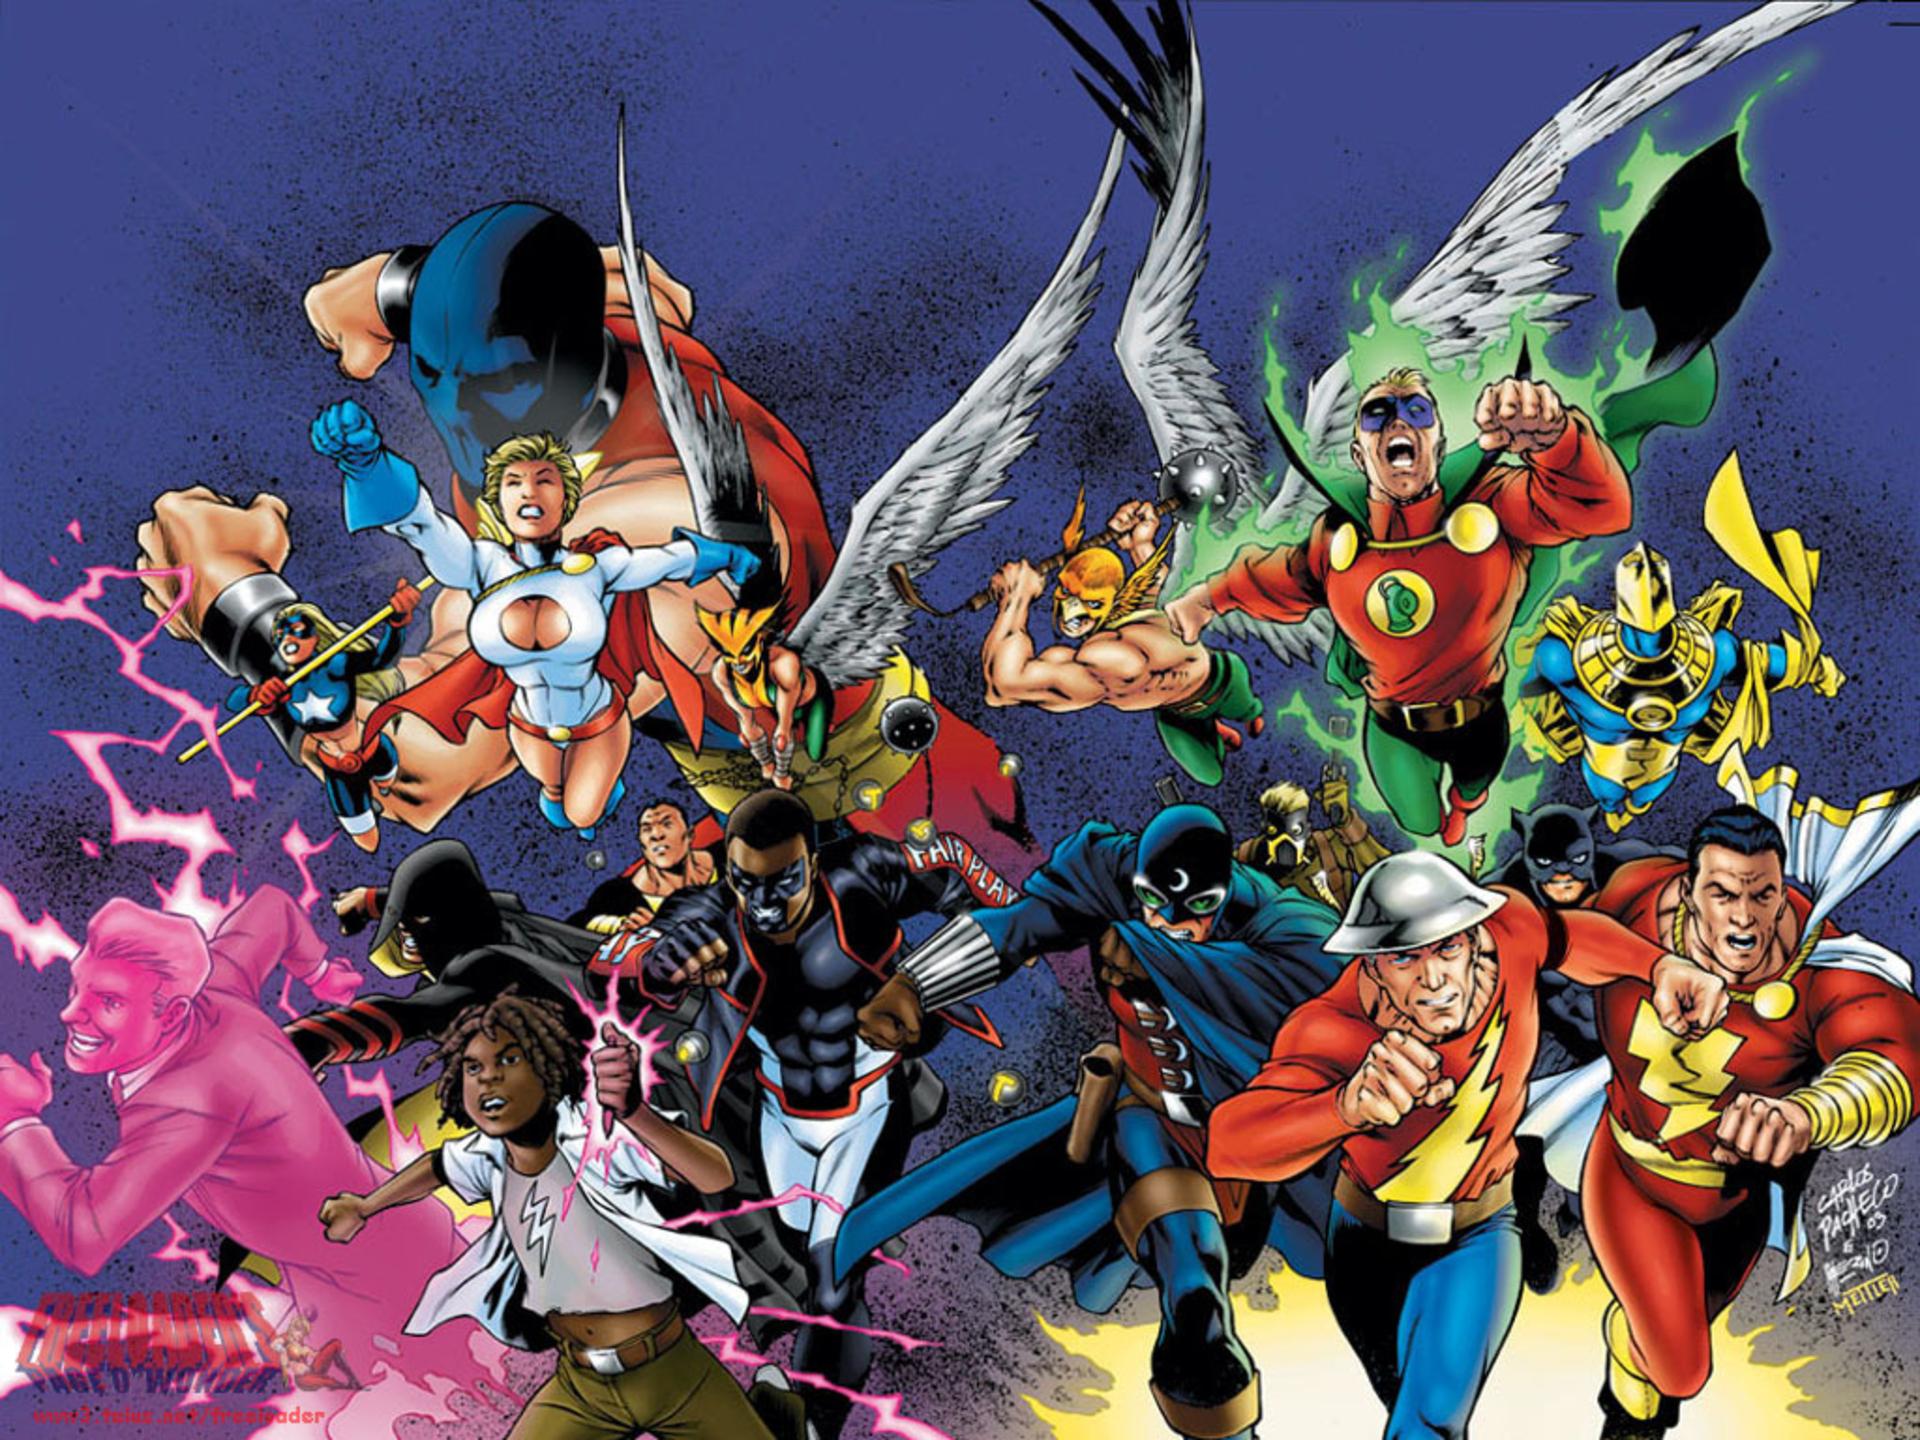 Dc comics hd wallpaper wallpapersafari - Dc characters wallpaper hd ...